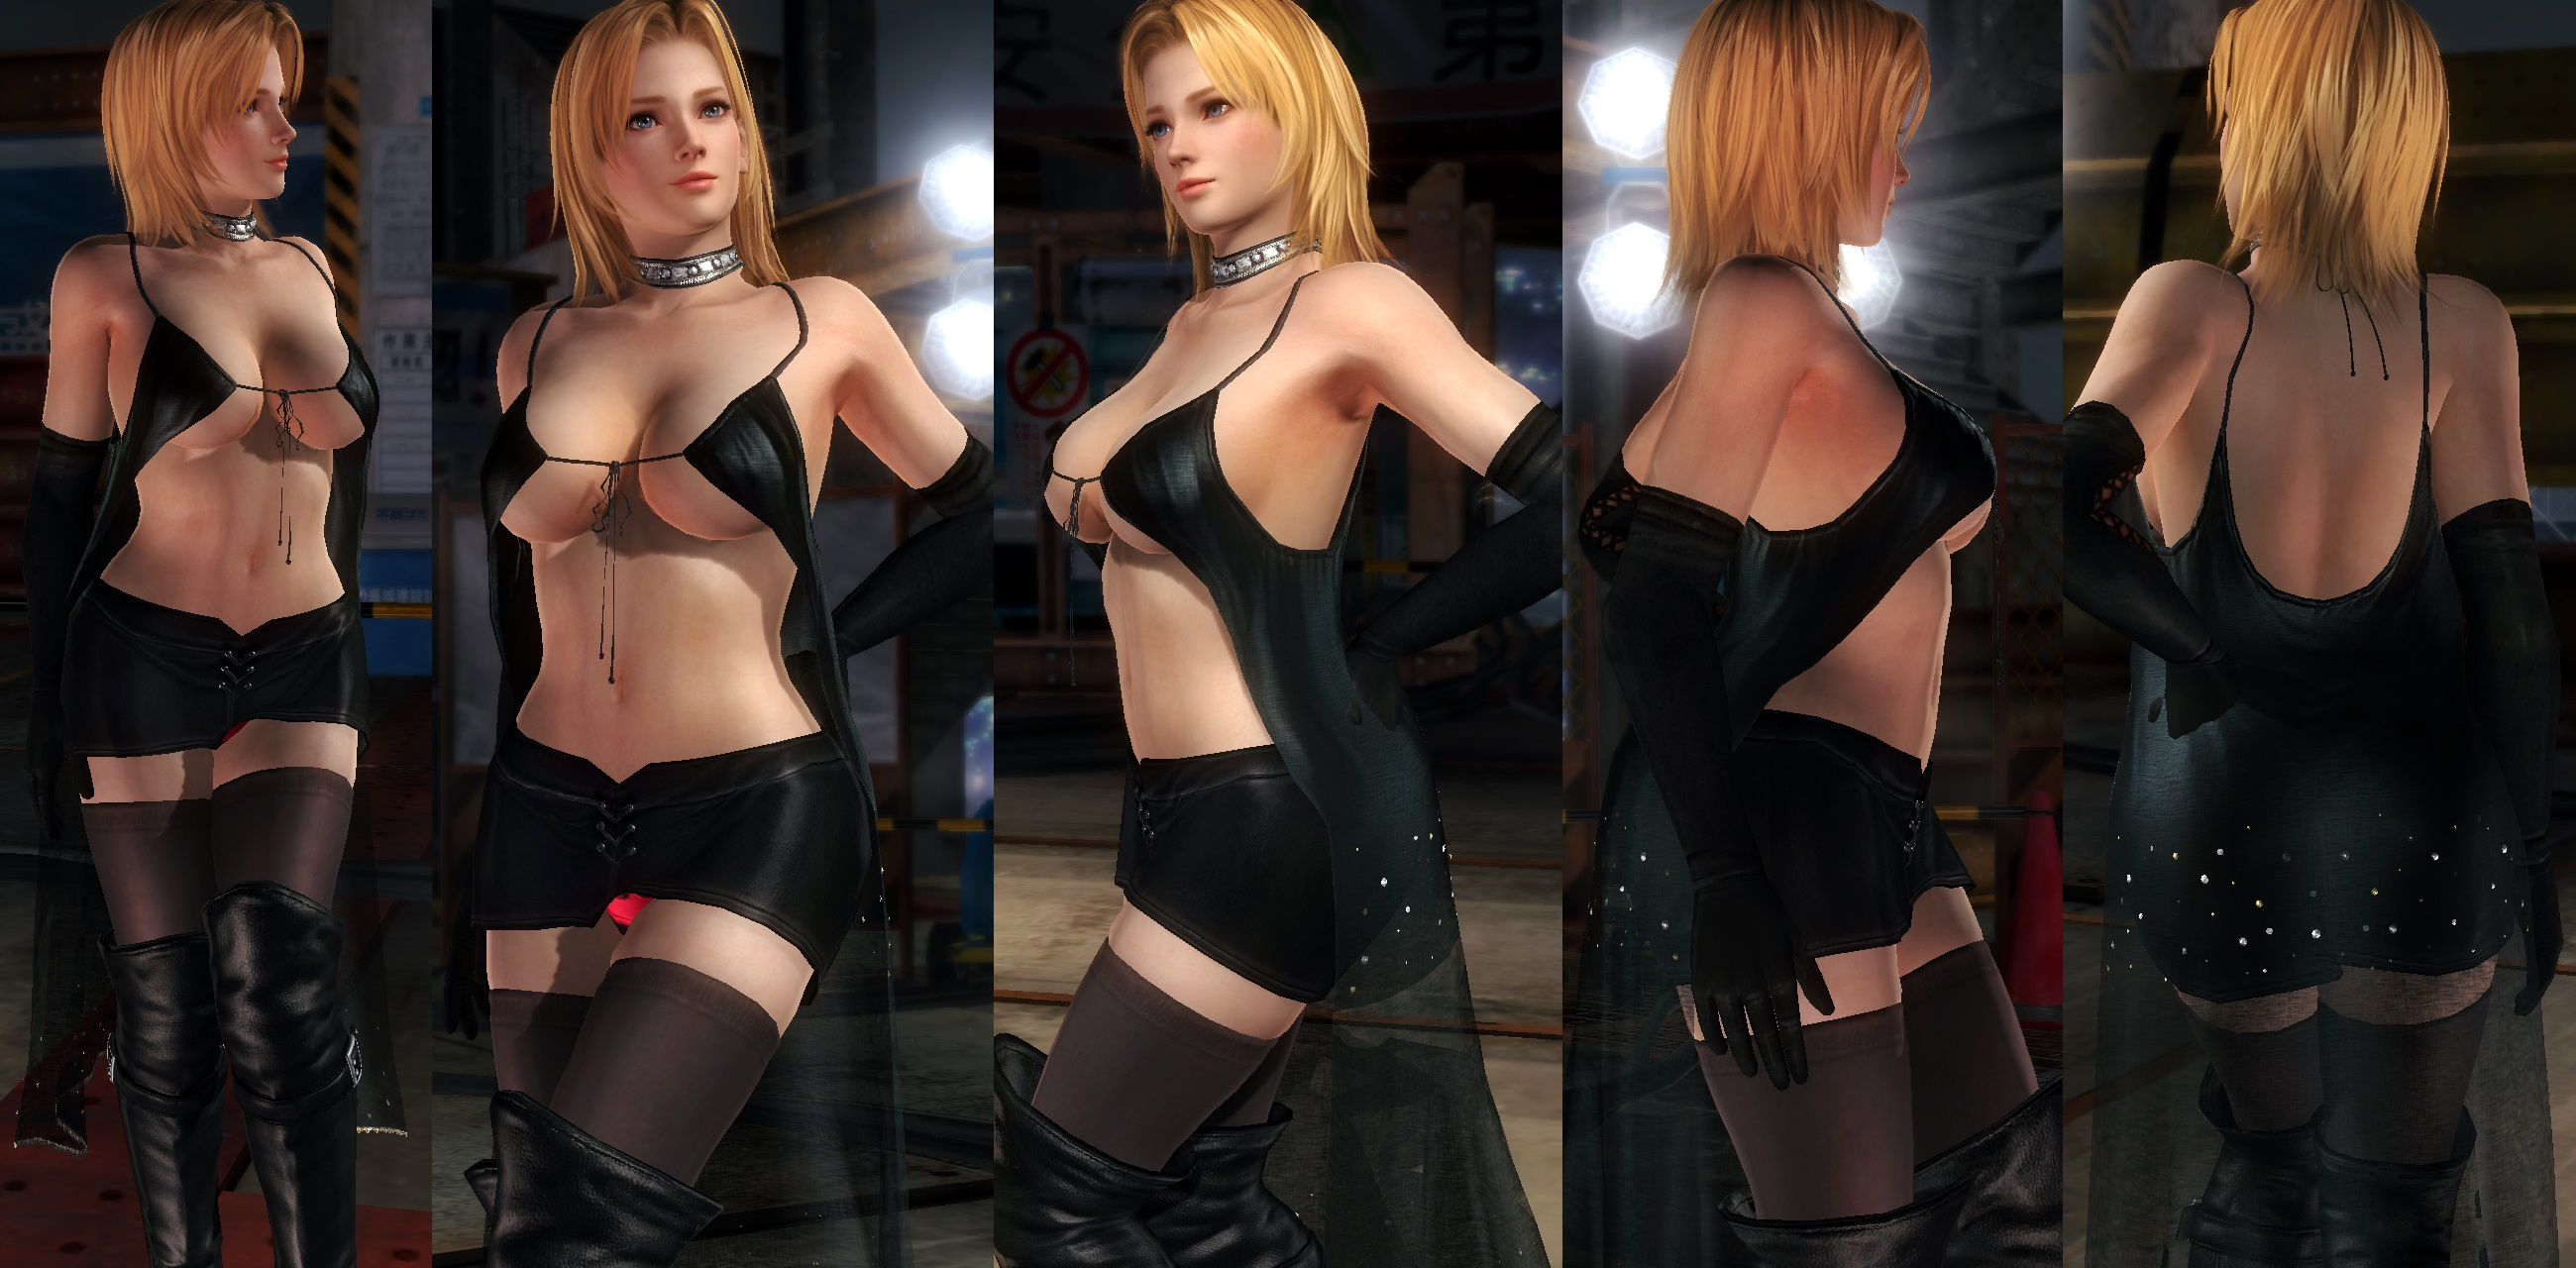 Tina black mantle skirt V2 by funnybunny666